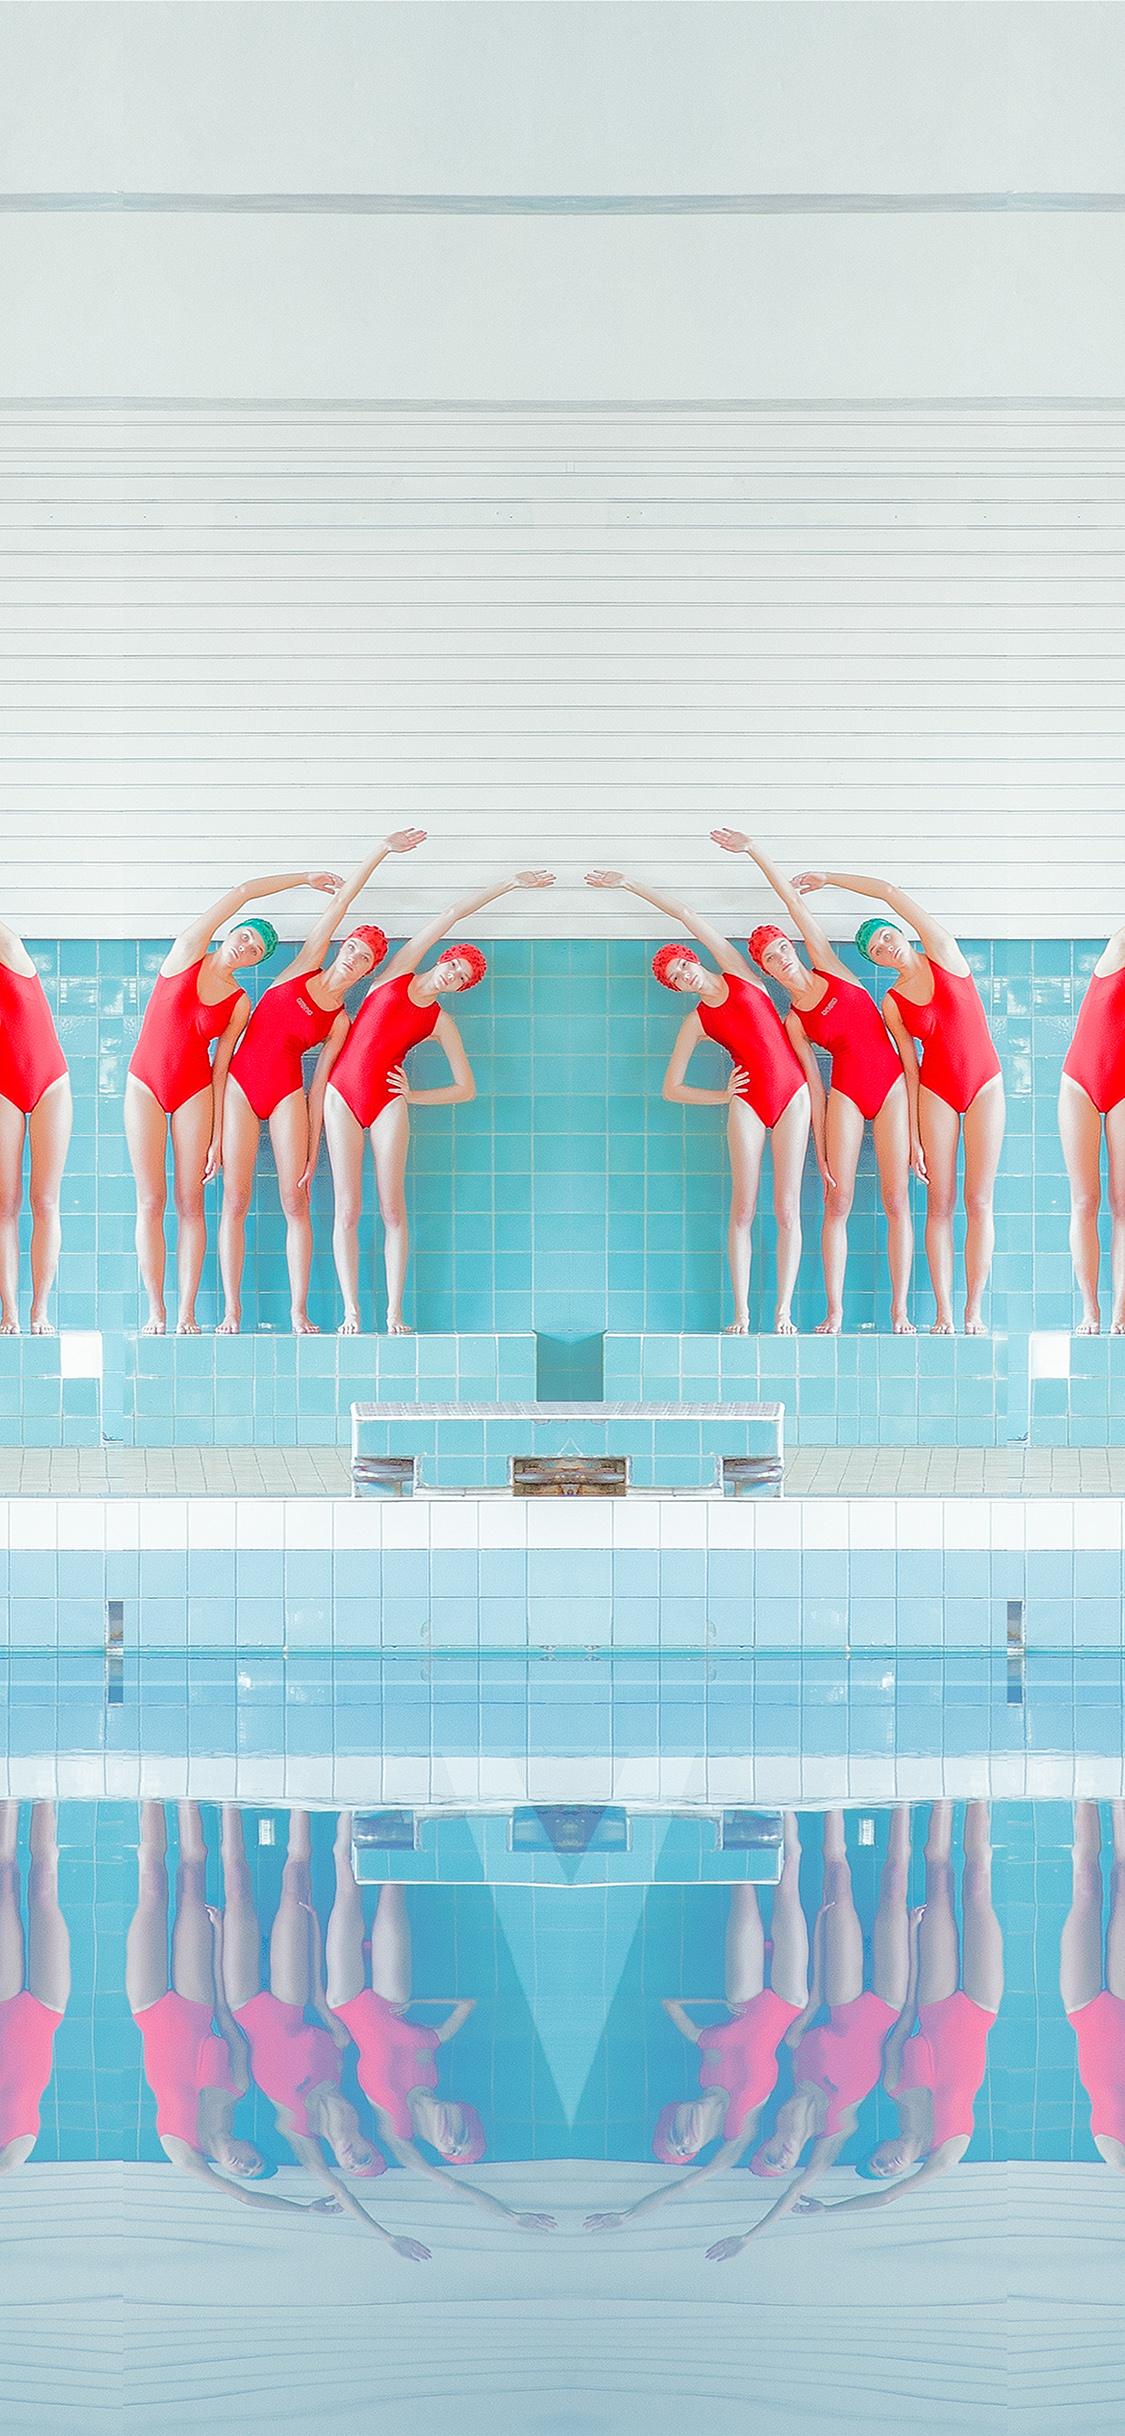 iPhoneXpapers.com-Apple-iPhone-wallpaper-ba68-swim-girls-illustration-art